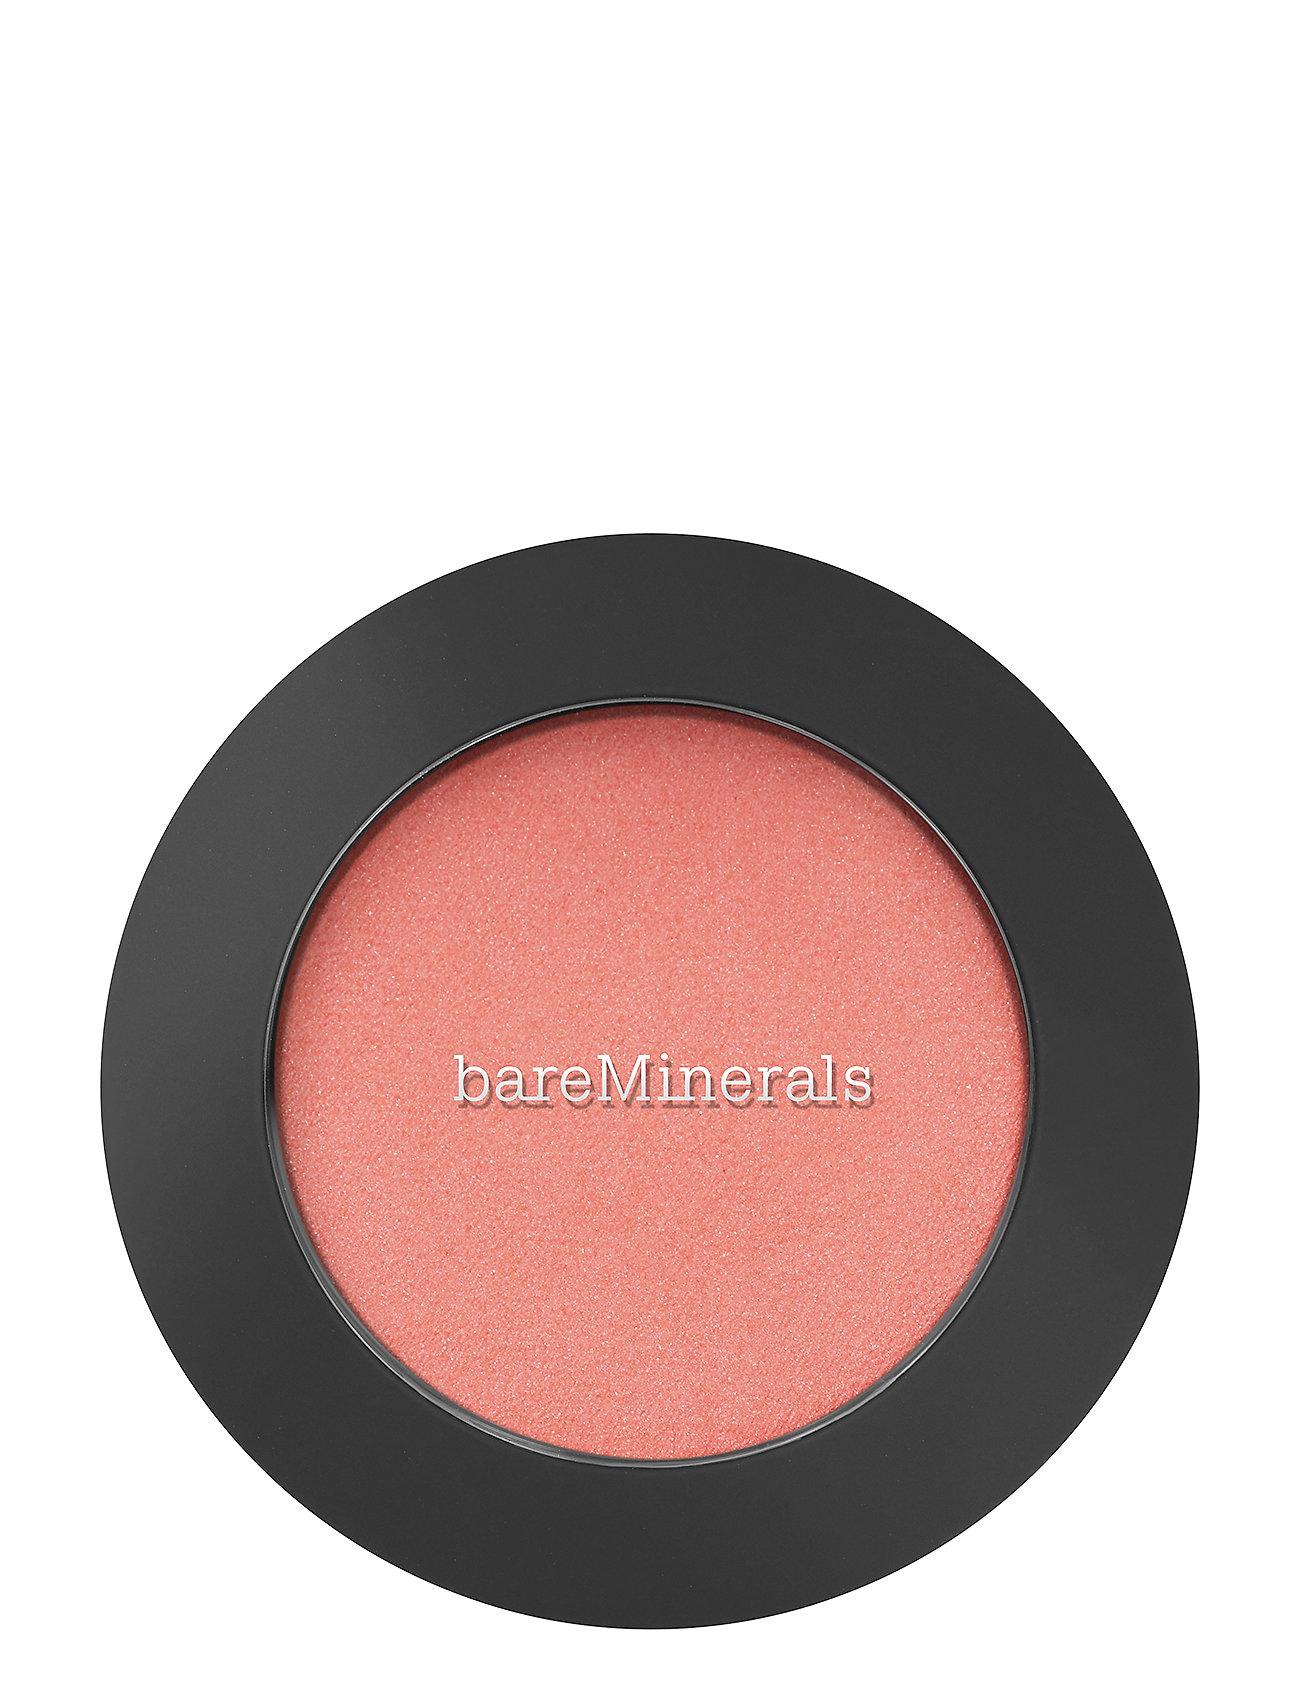 Image of Bounce & Blur Blush Coral Cloud Beauty WOMEN Makeup Face Blush Lyserød BareMinerals (3270673173)